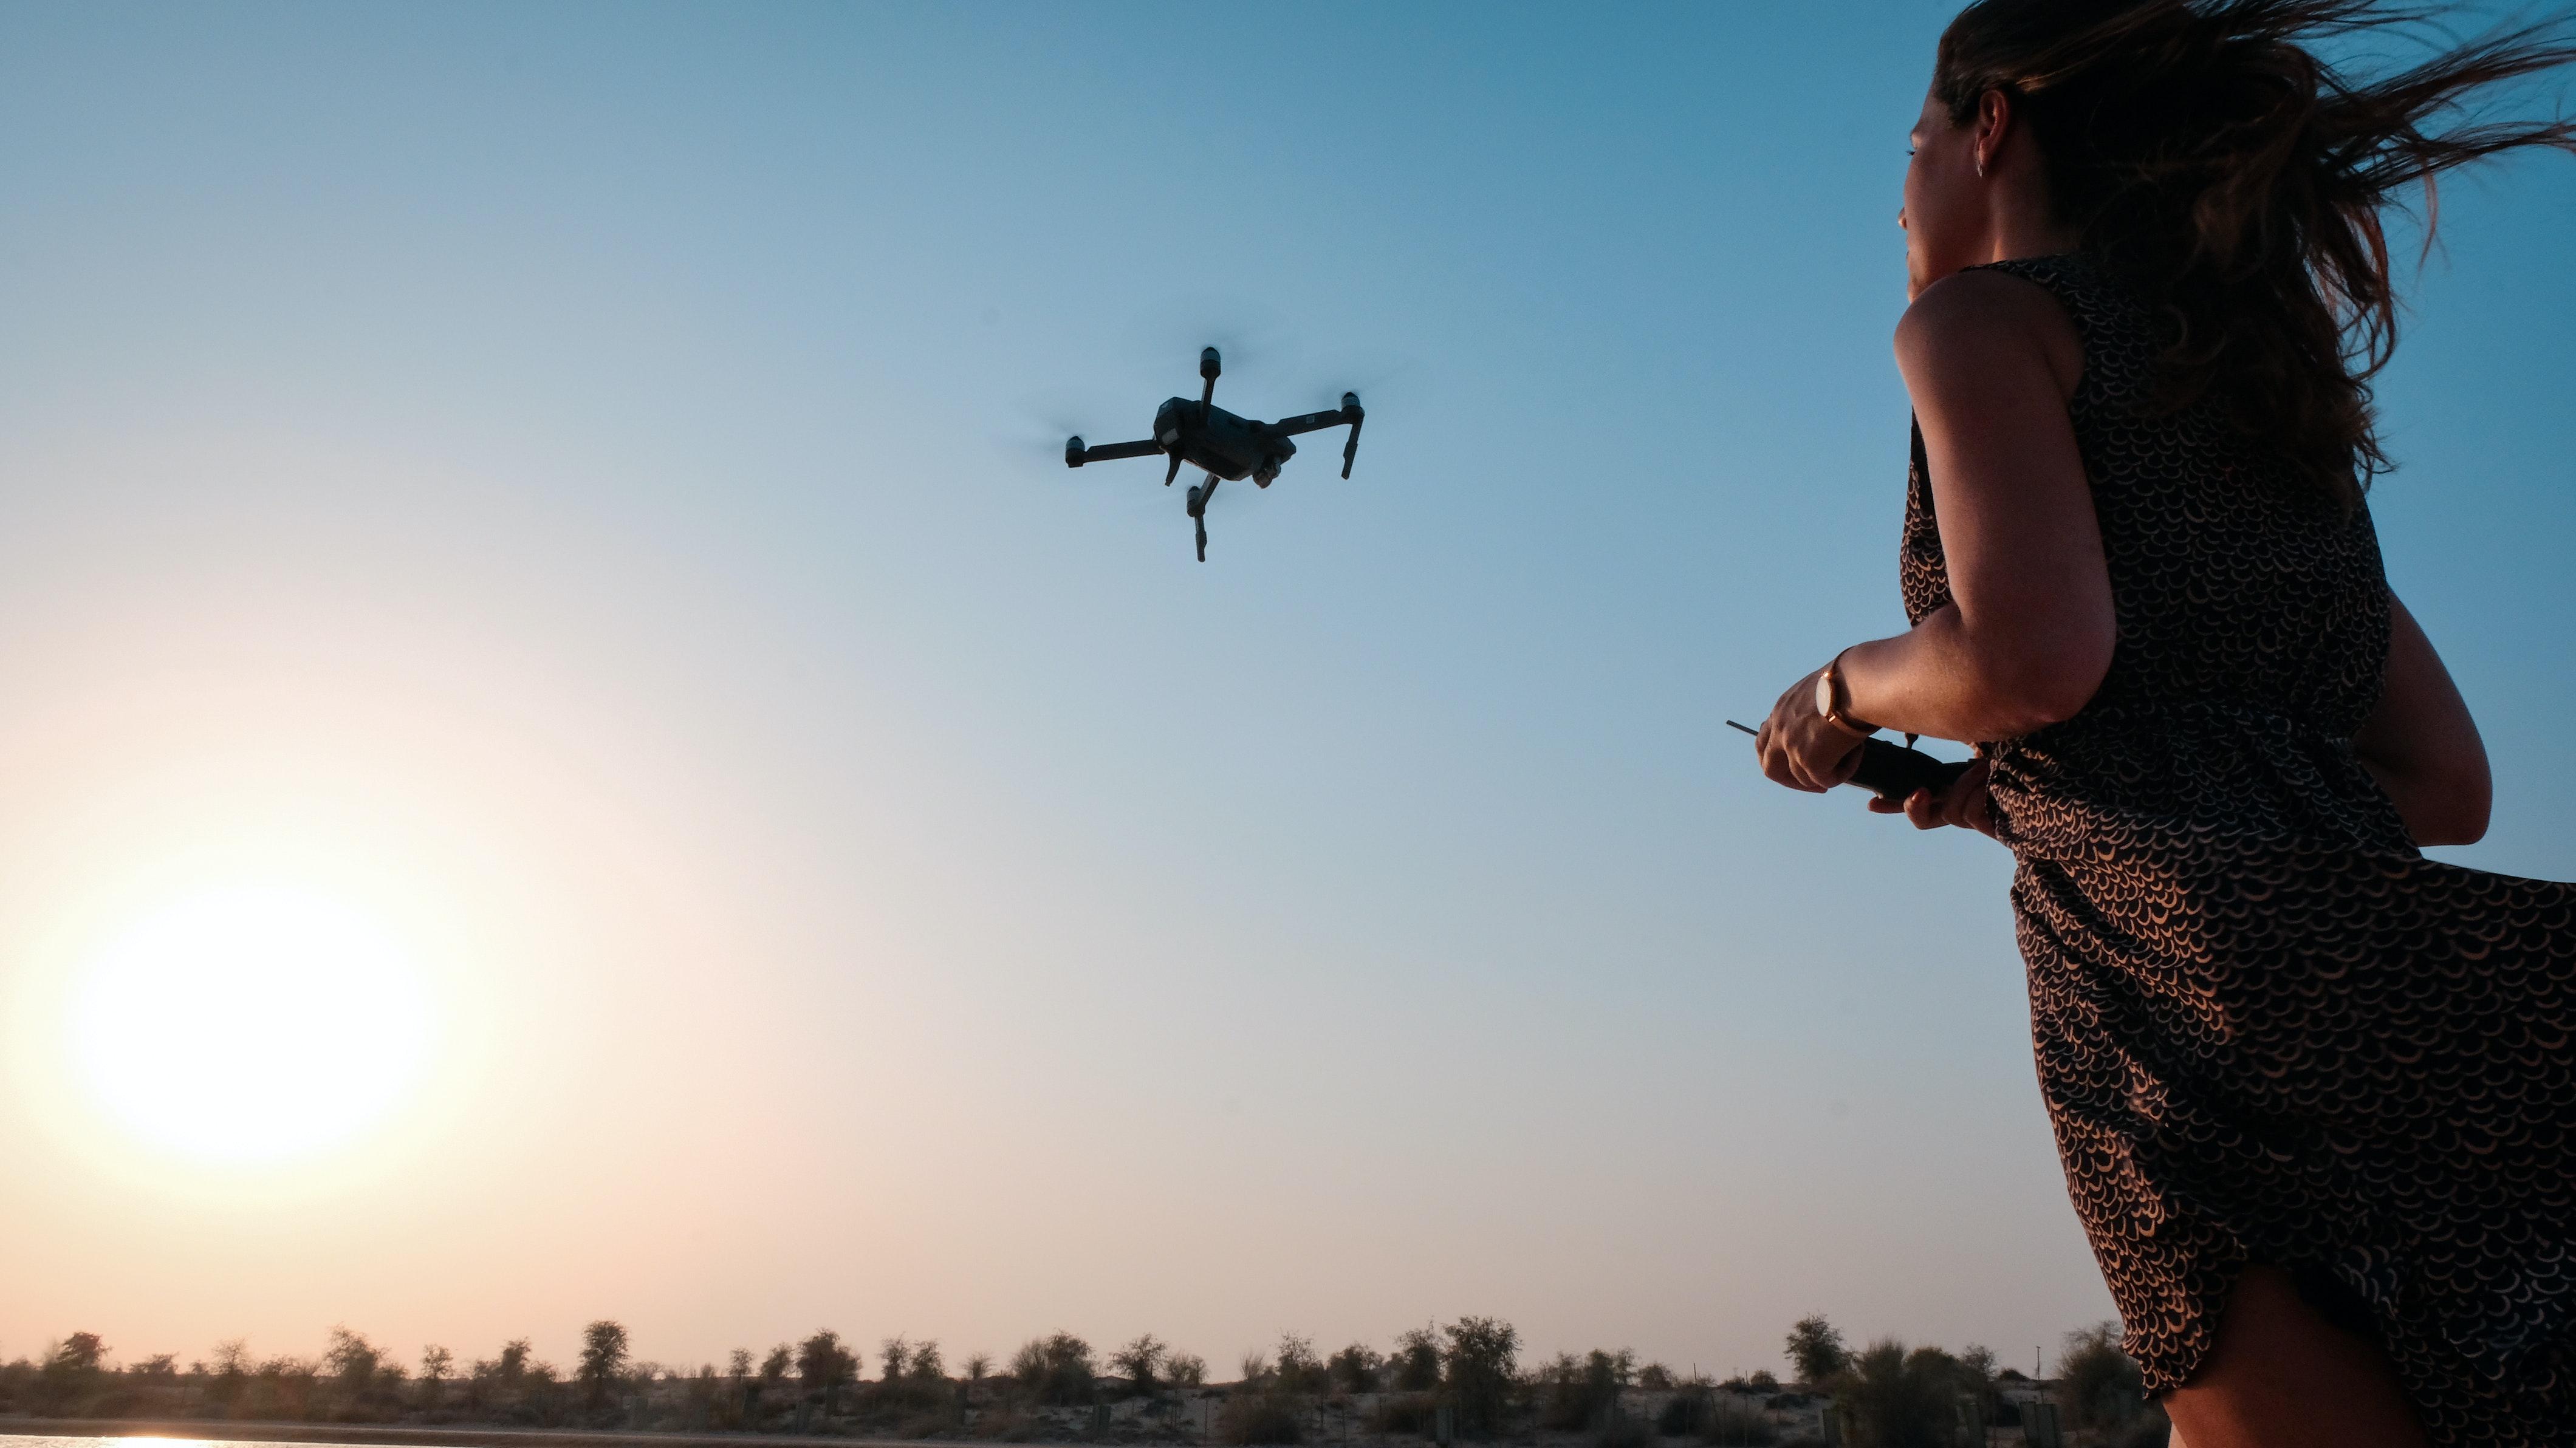 chica operando un dron